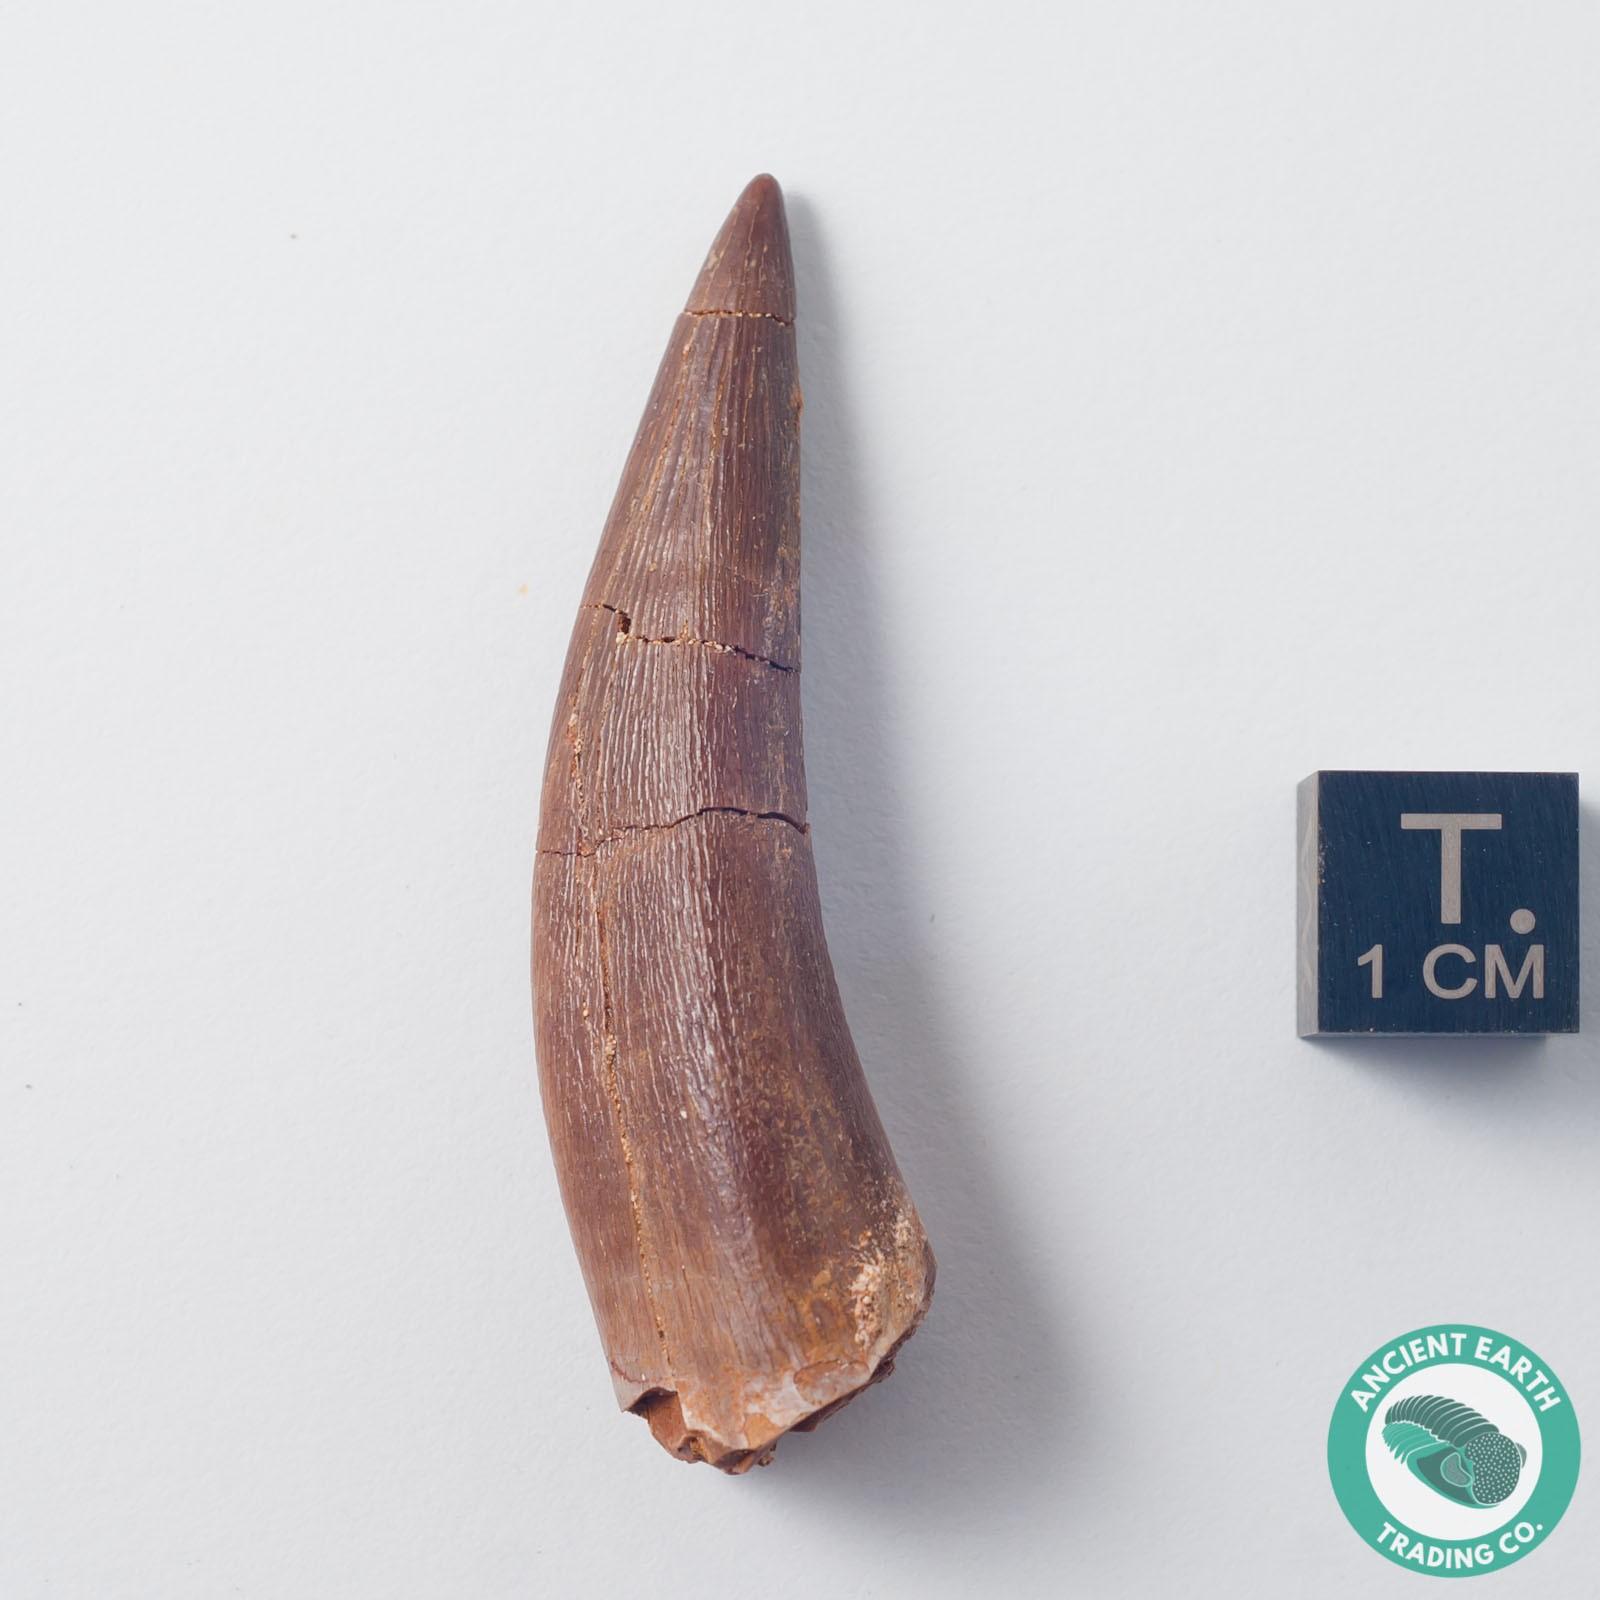 2.01 in. Plesiosaur Zarafasaura Fossil Tooth - Morocco